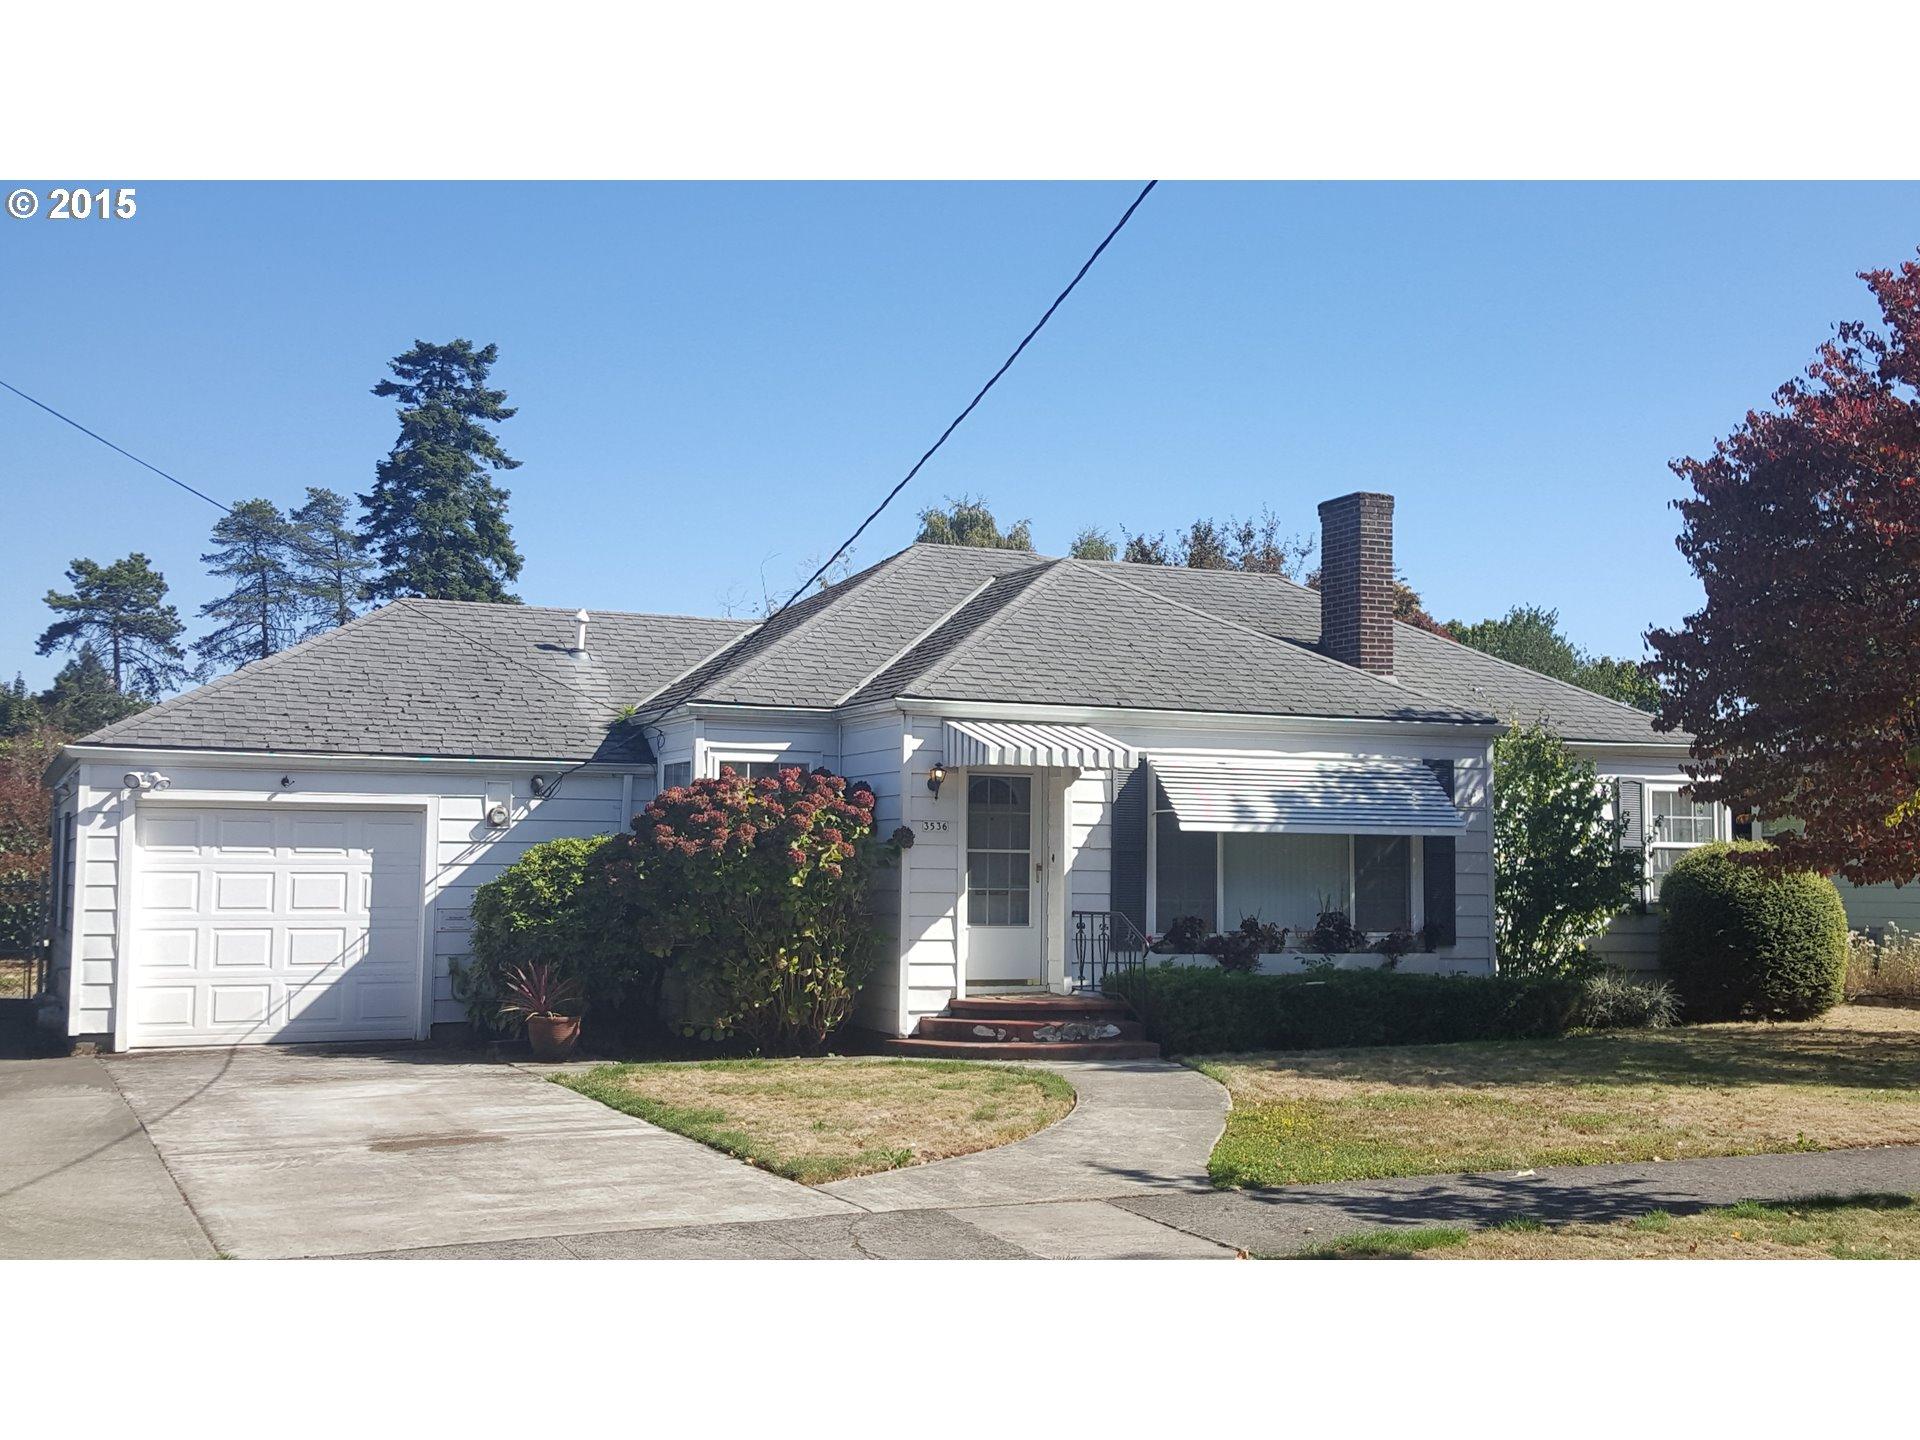 3536 SE 76TH AVE, Portland OR 97206